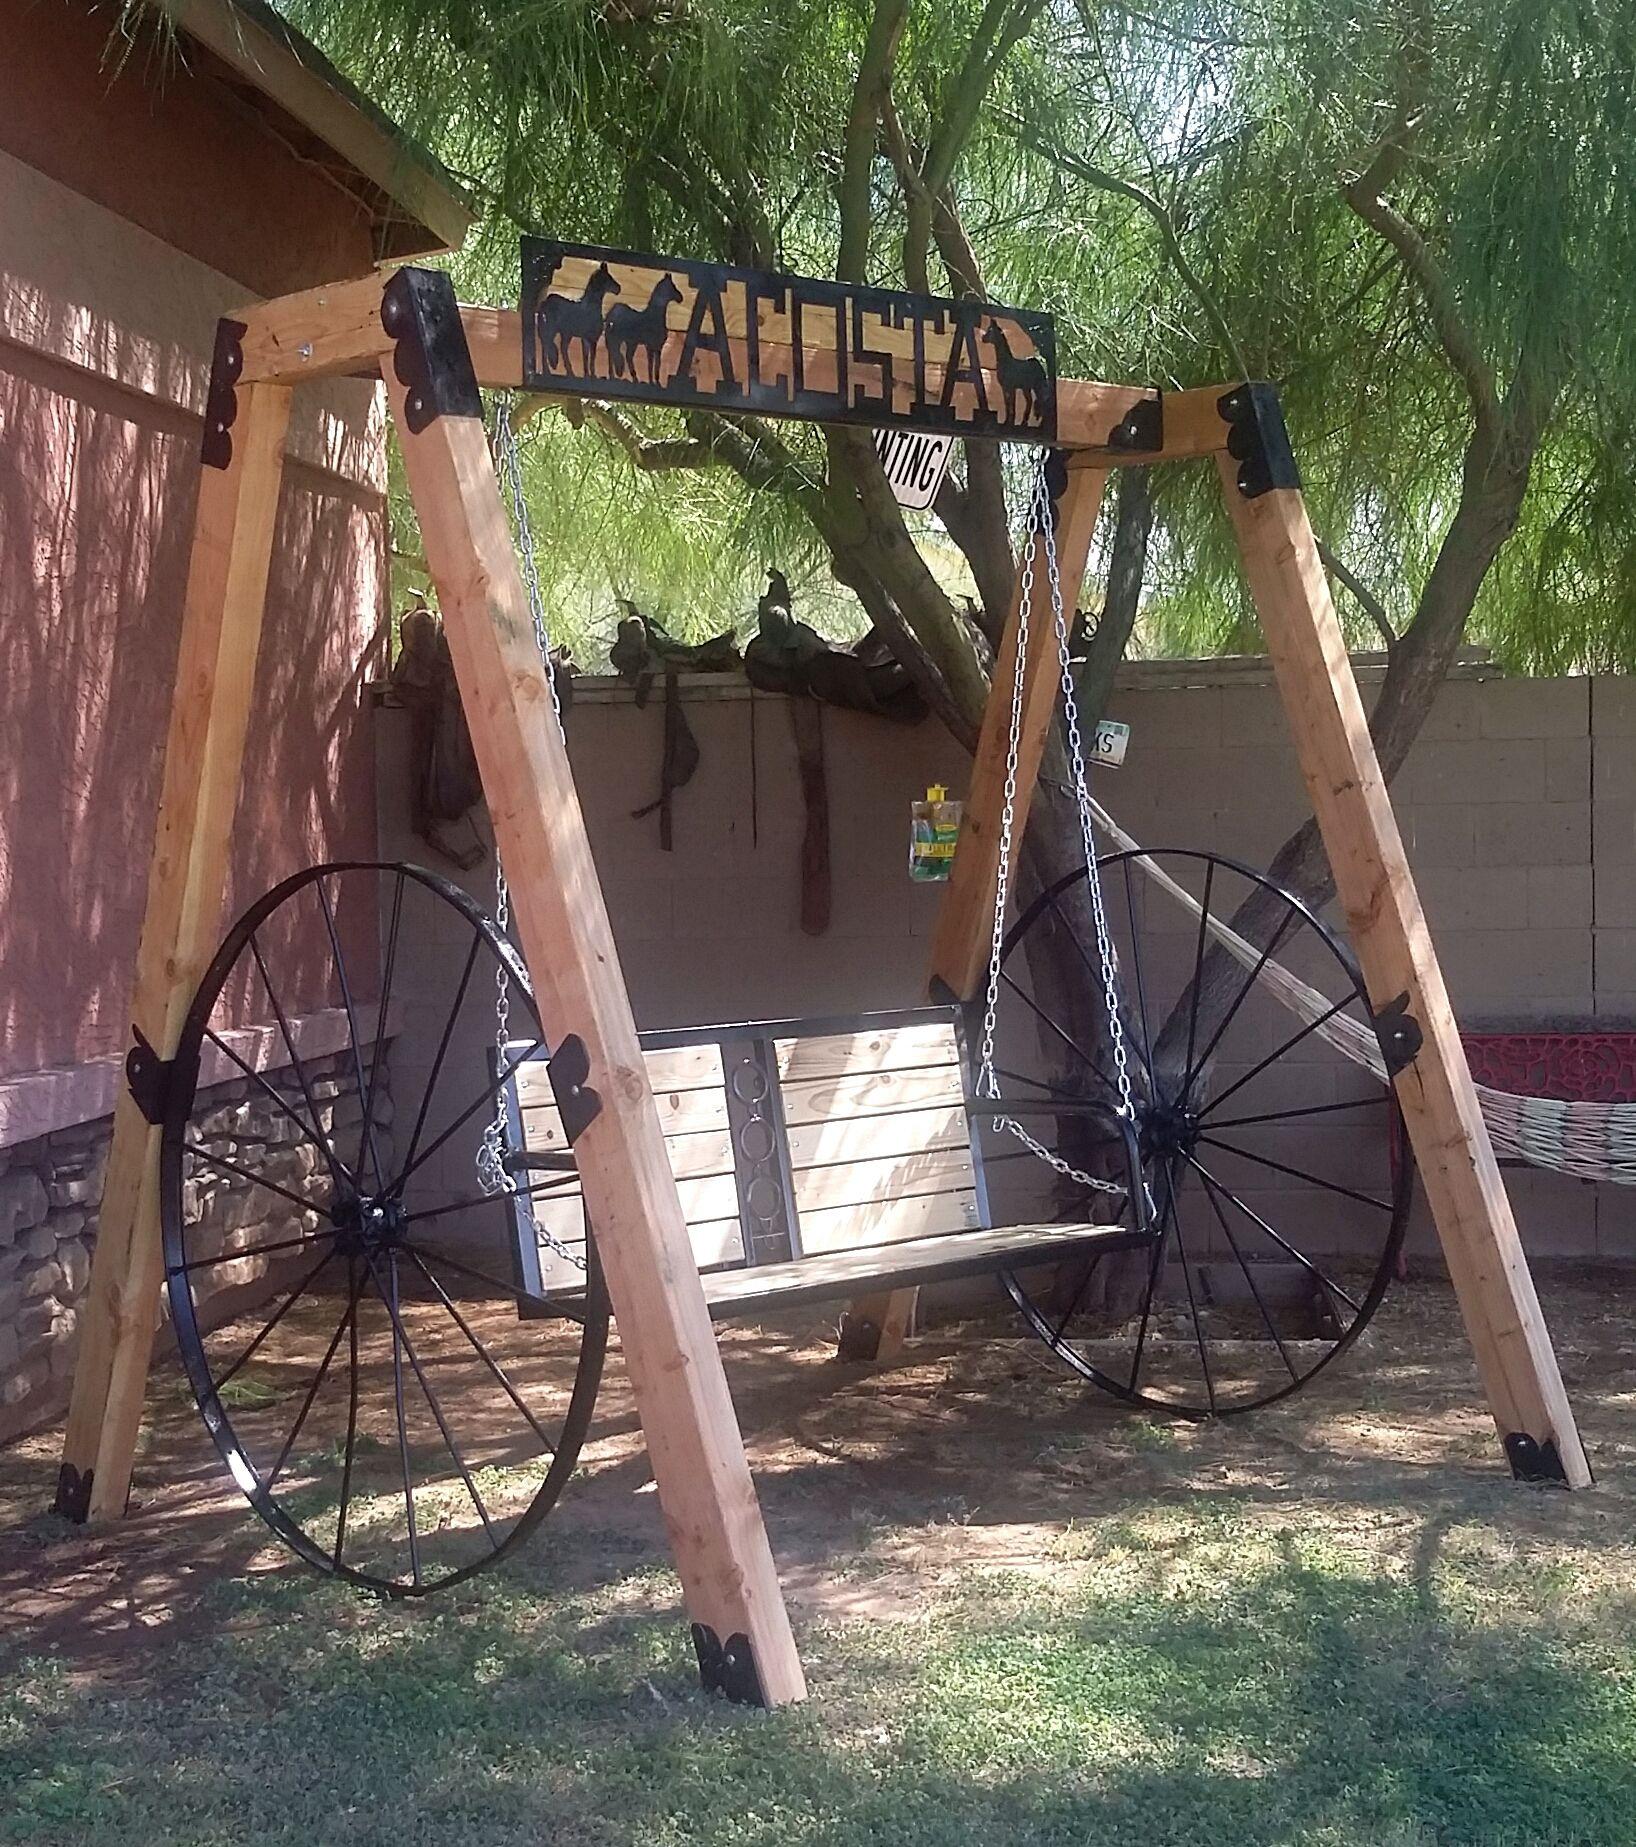 Wooded Metal Wagon Wheels Swing Set With Beer Holder In